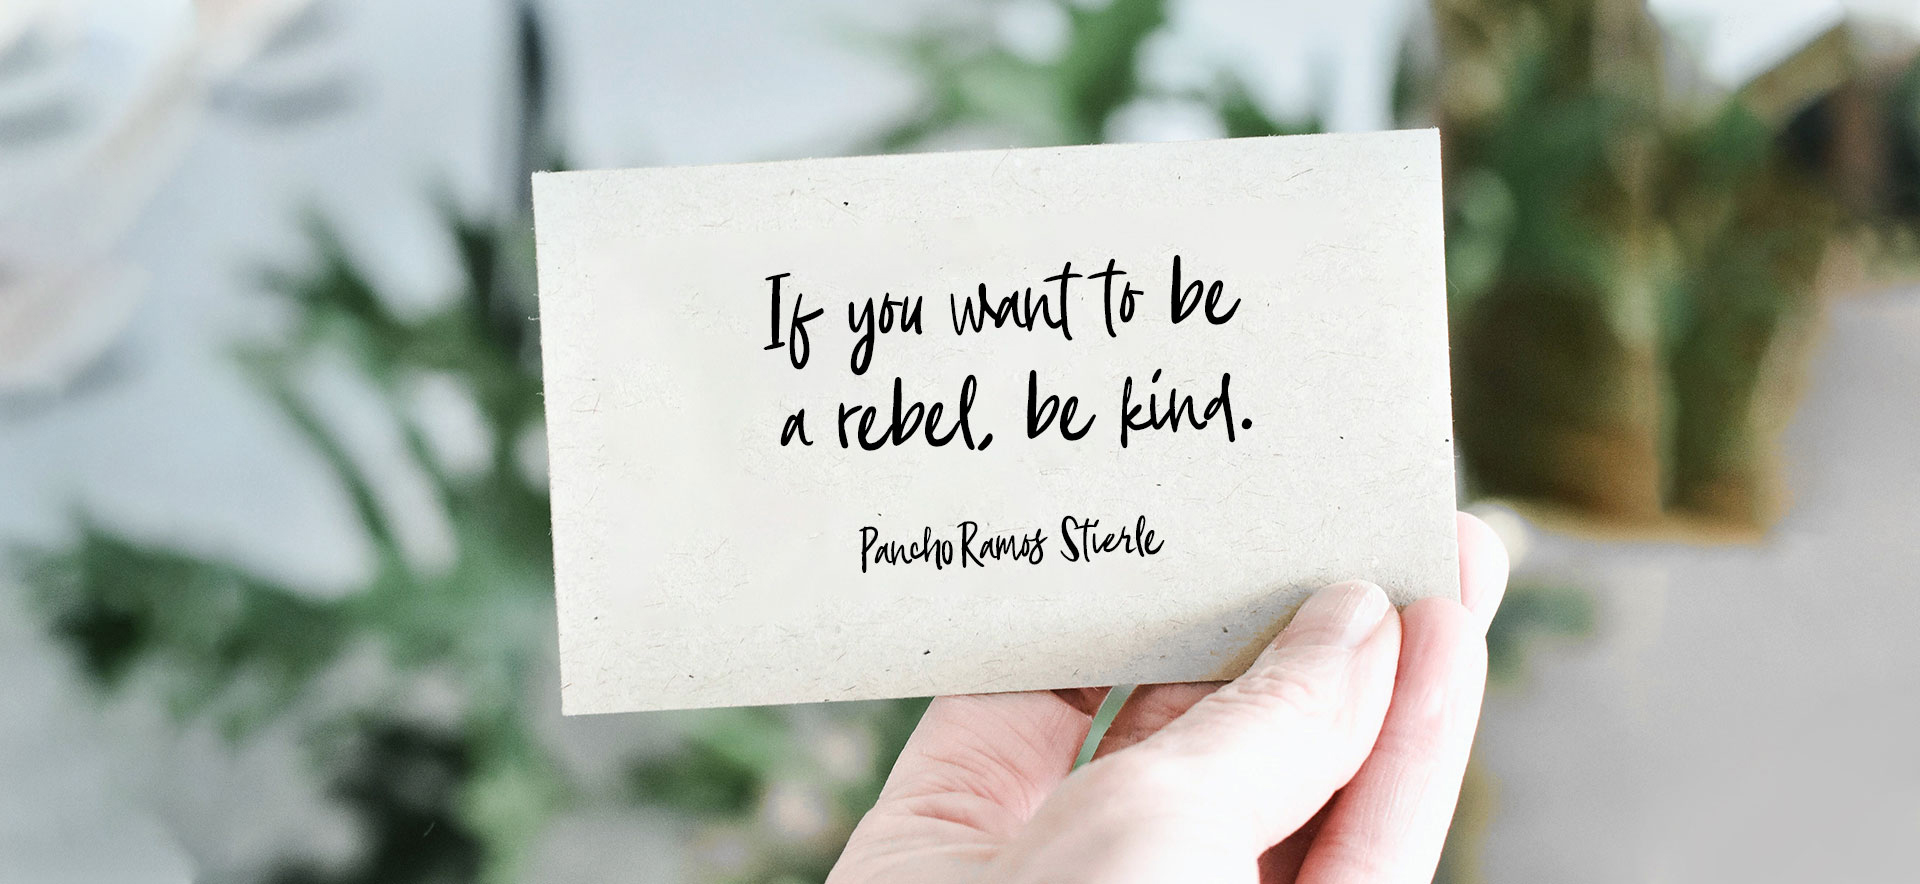 kindness-article.jpg